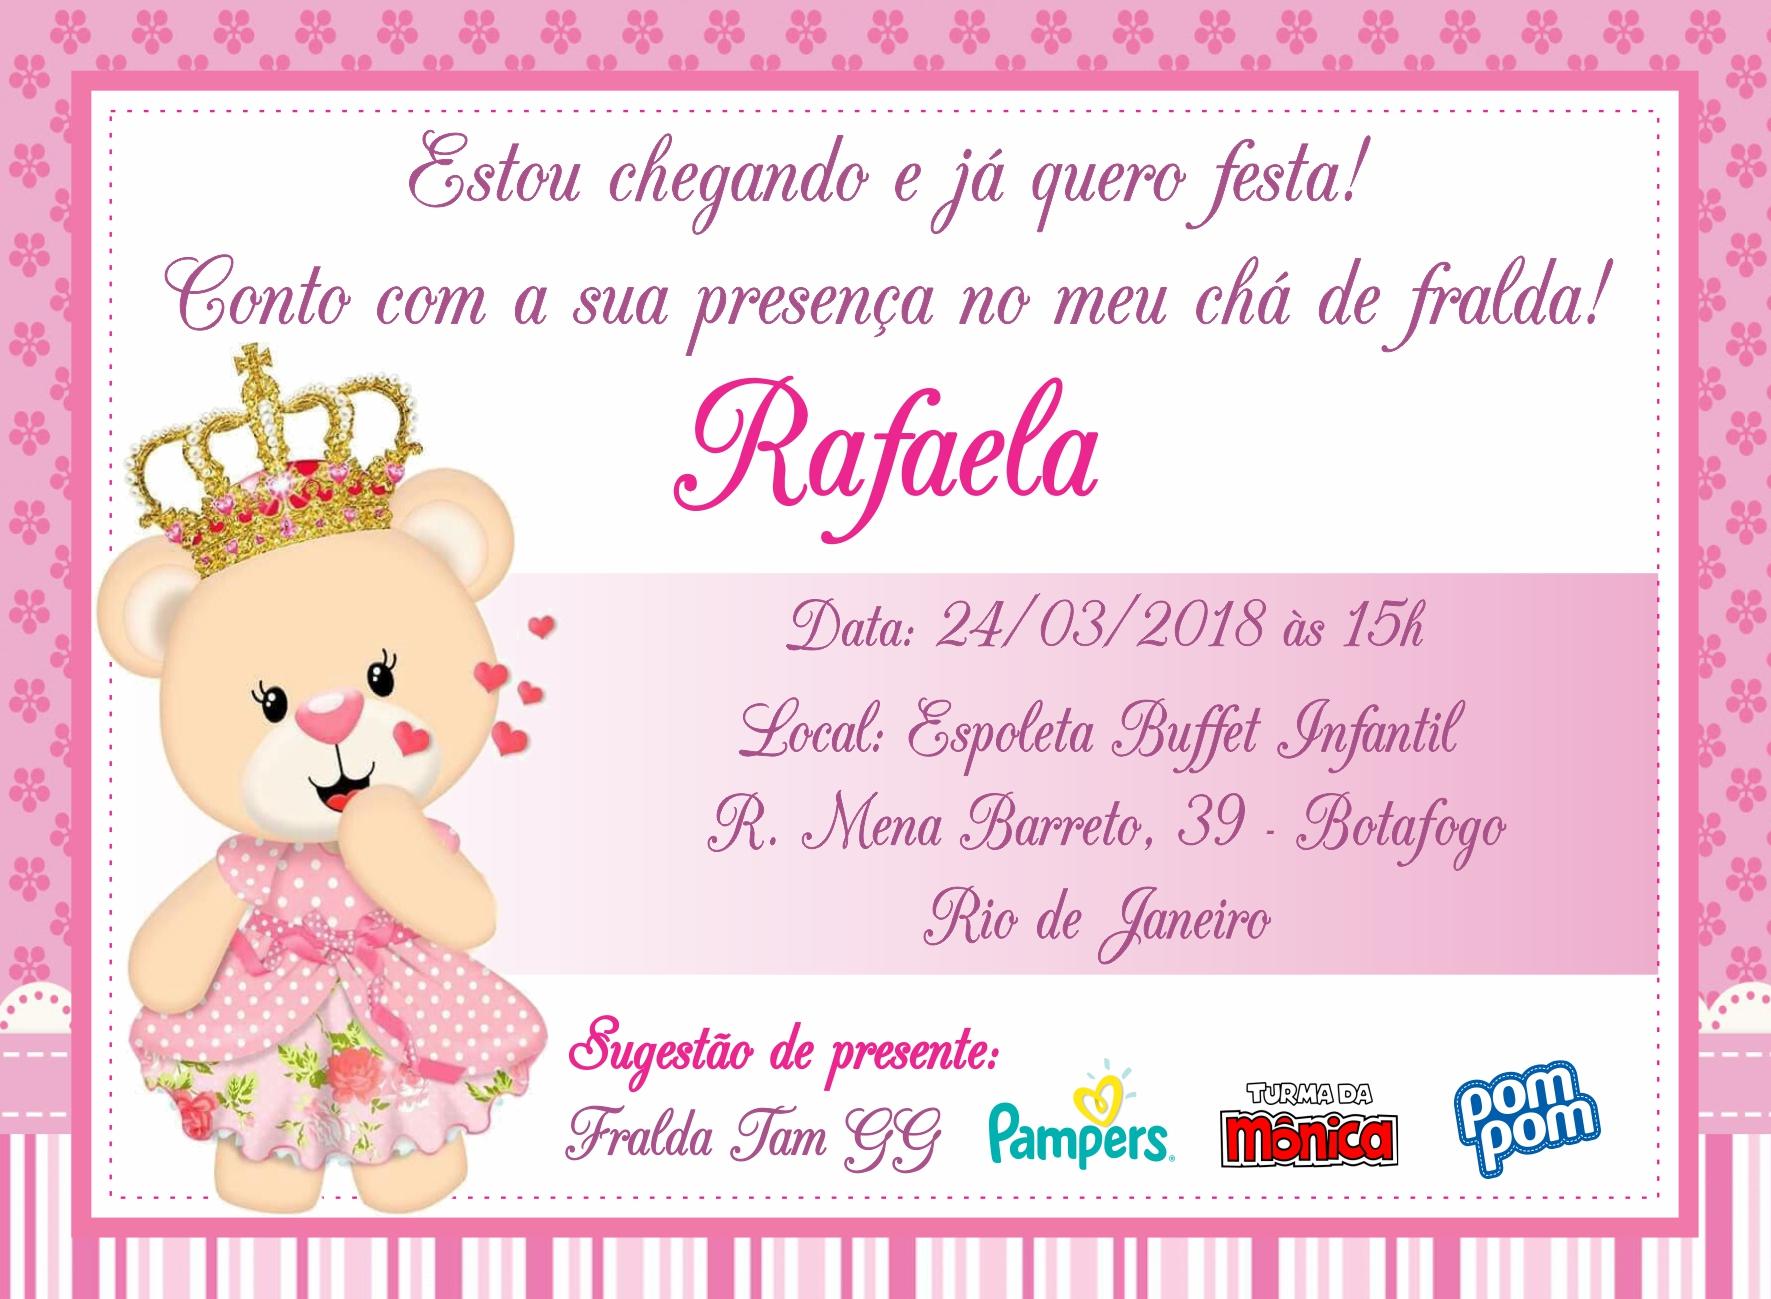 Convite Digital Chá De Fralda Ursa Princesa Rosa No Elo7 Marcante